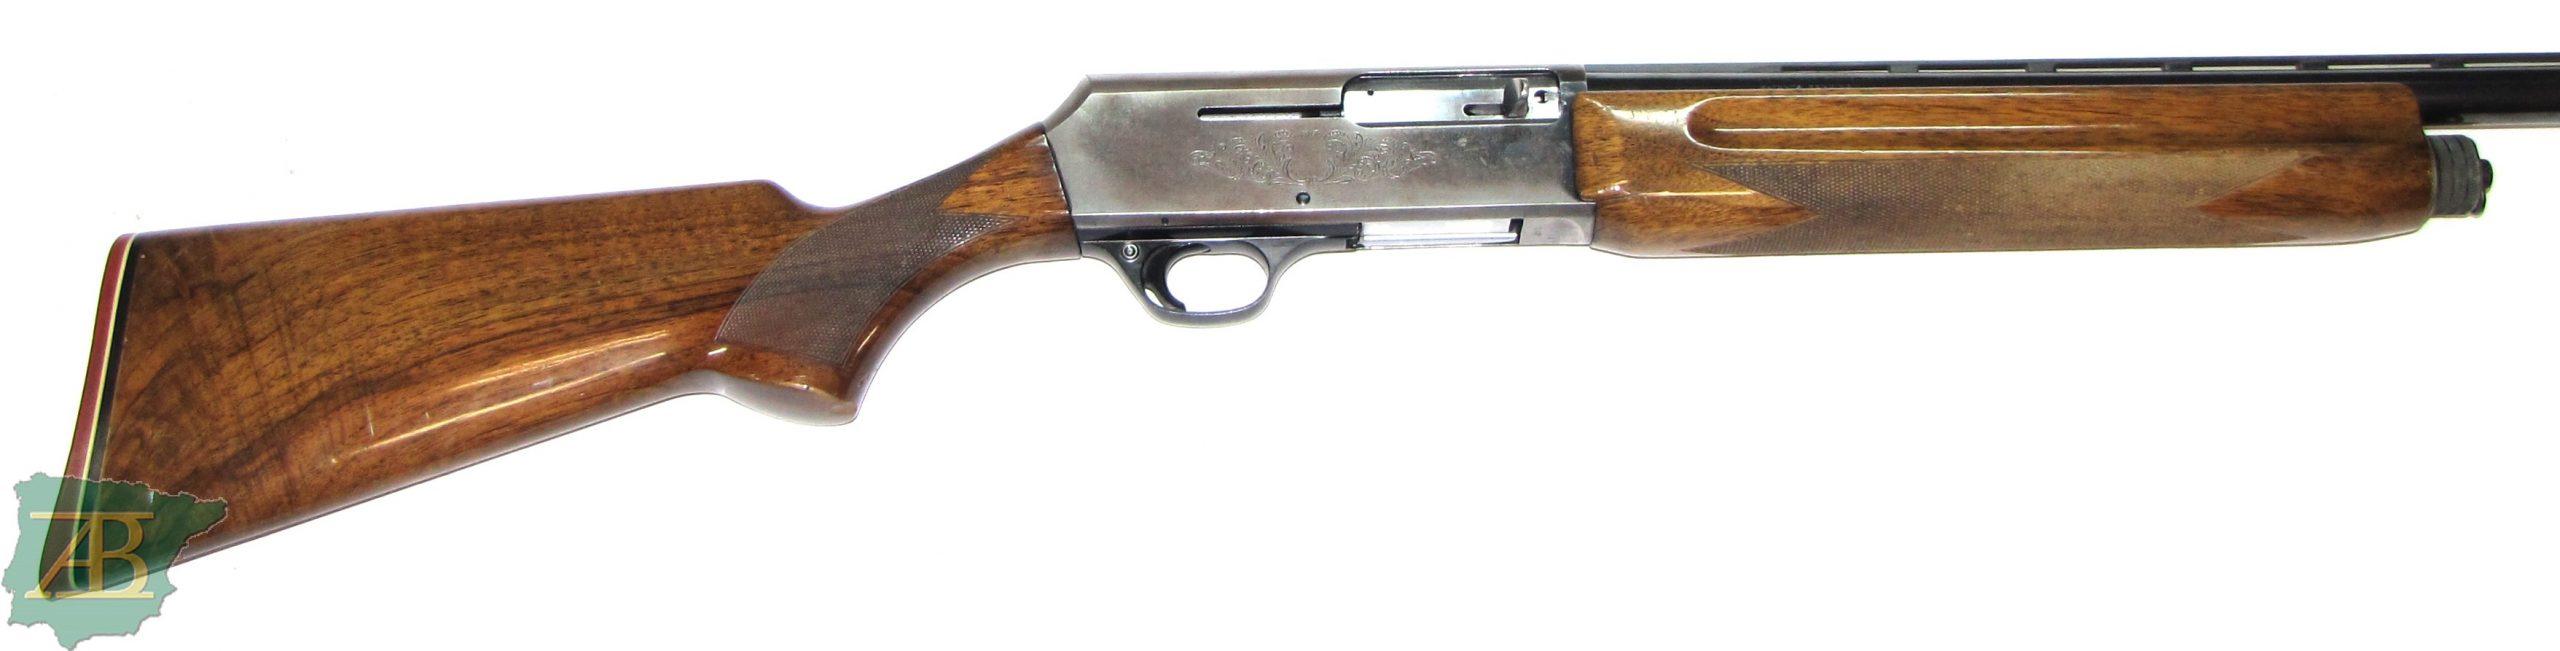 Escopeta semiautomática de caza BROWNING 2000 Ref 5579 y 5580-armeriaiberica-2